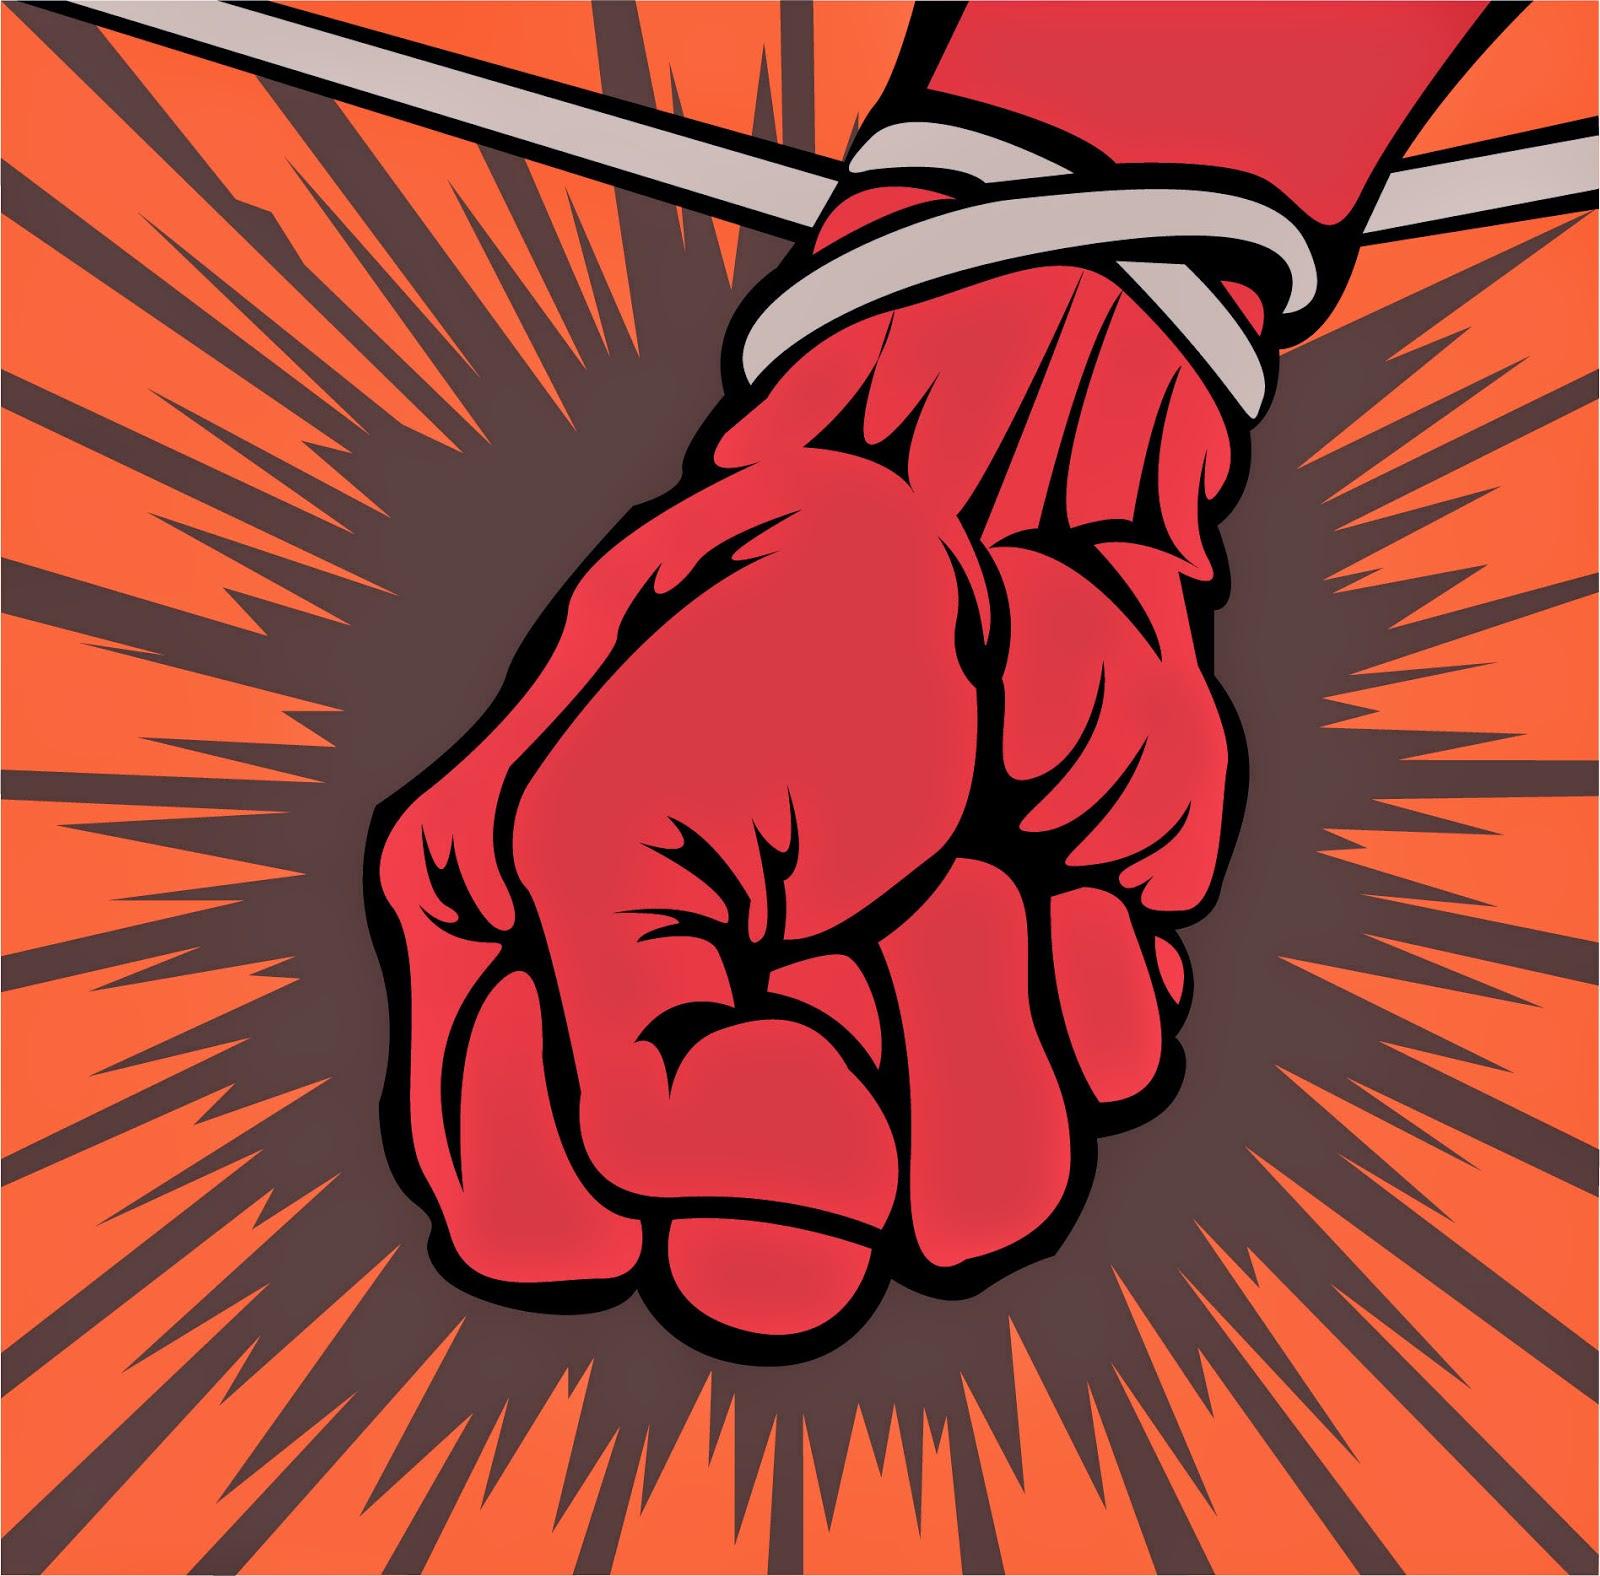 St. Anger - Metallica